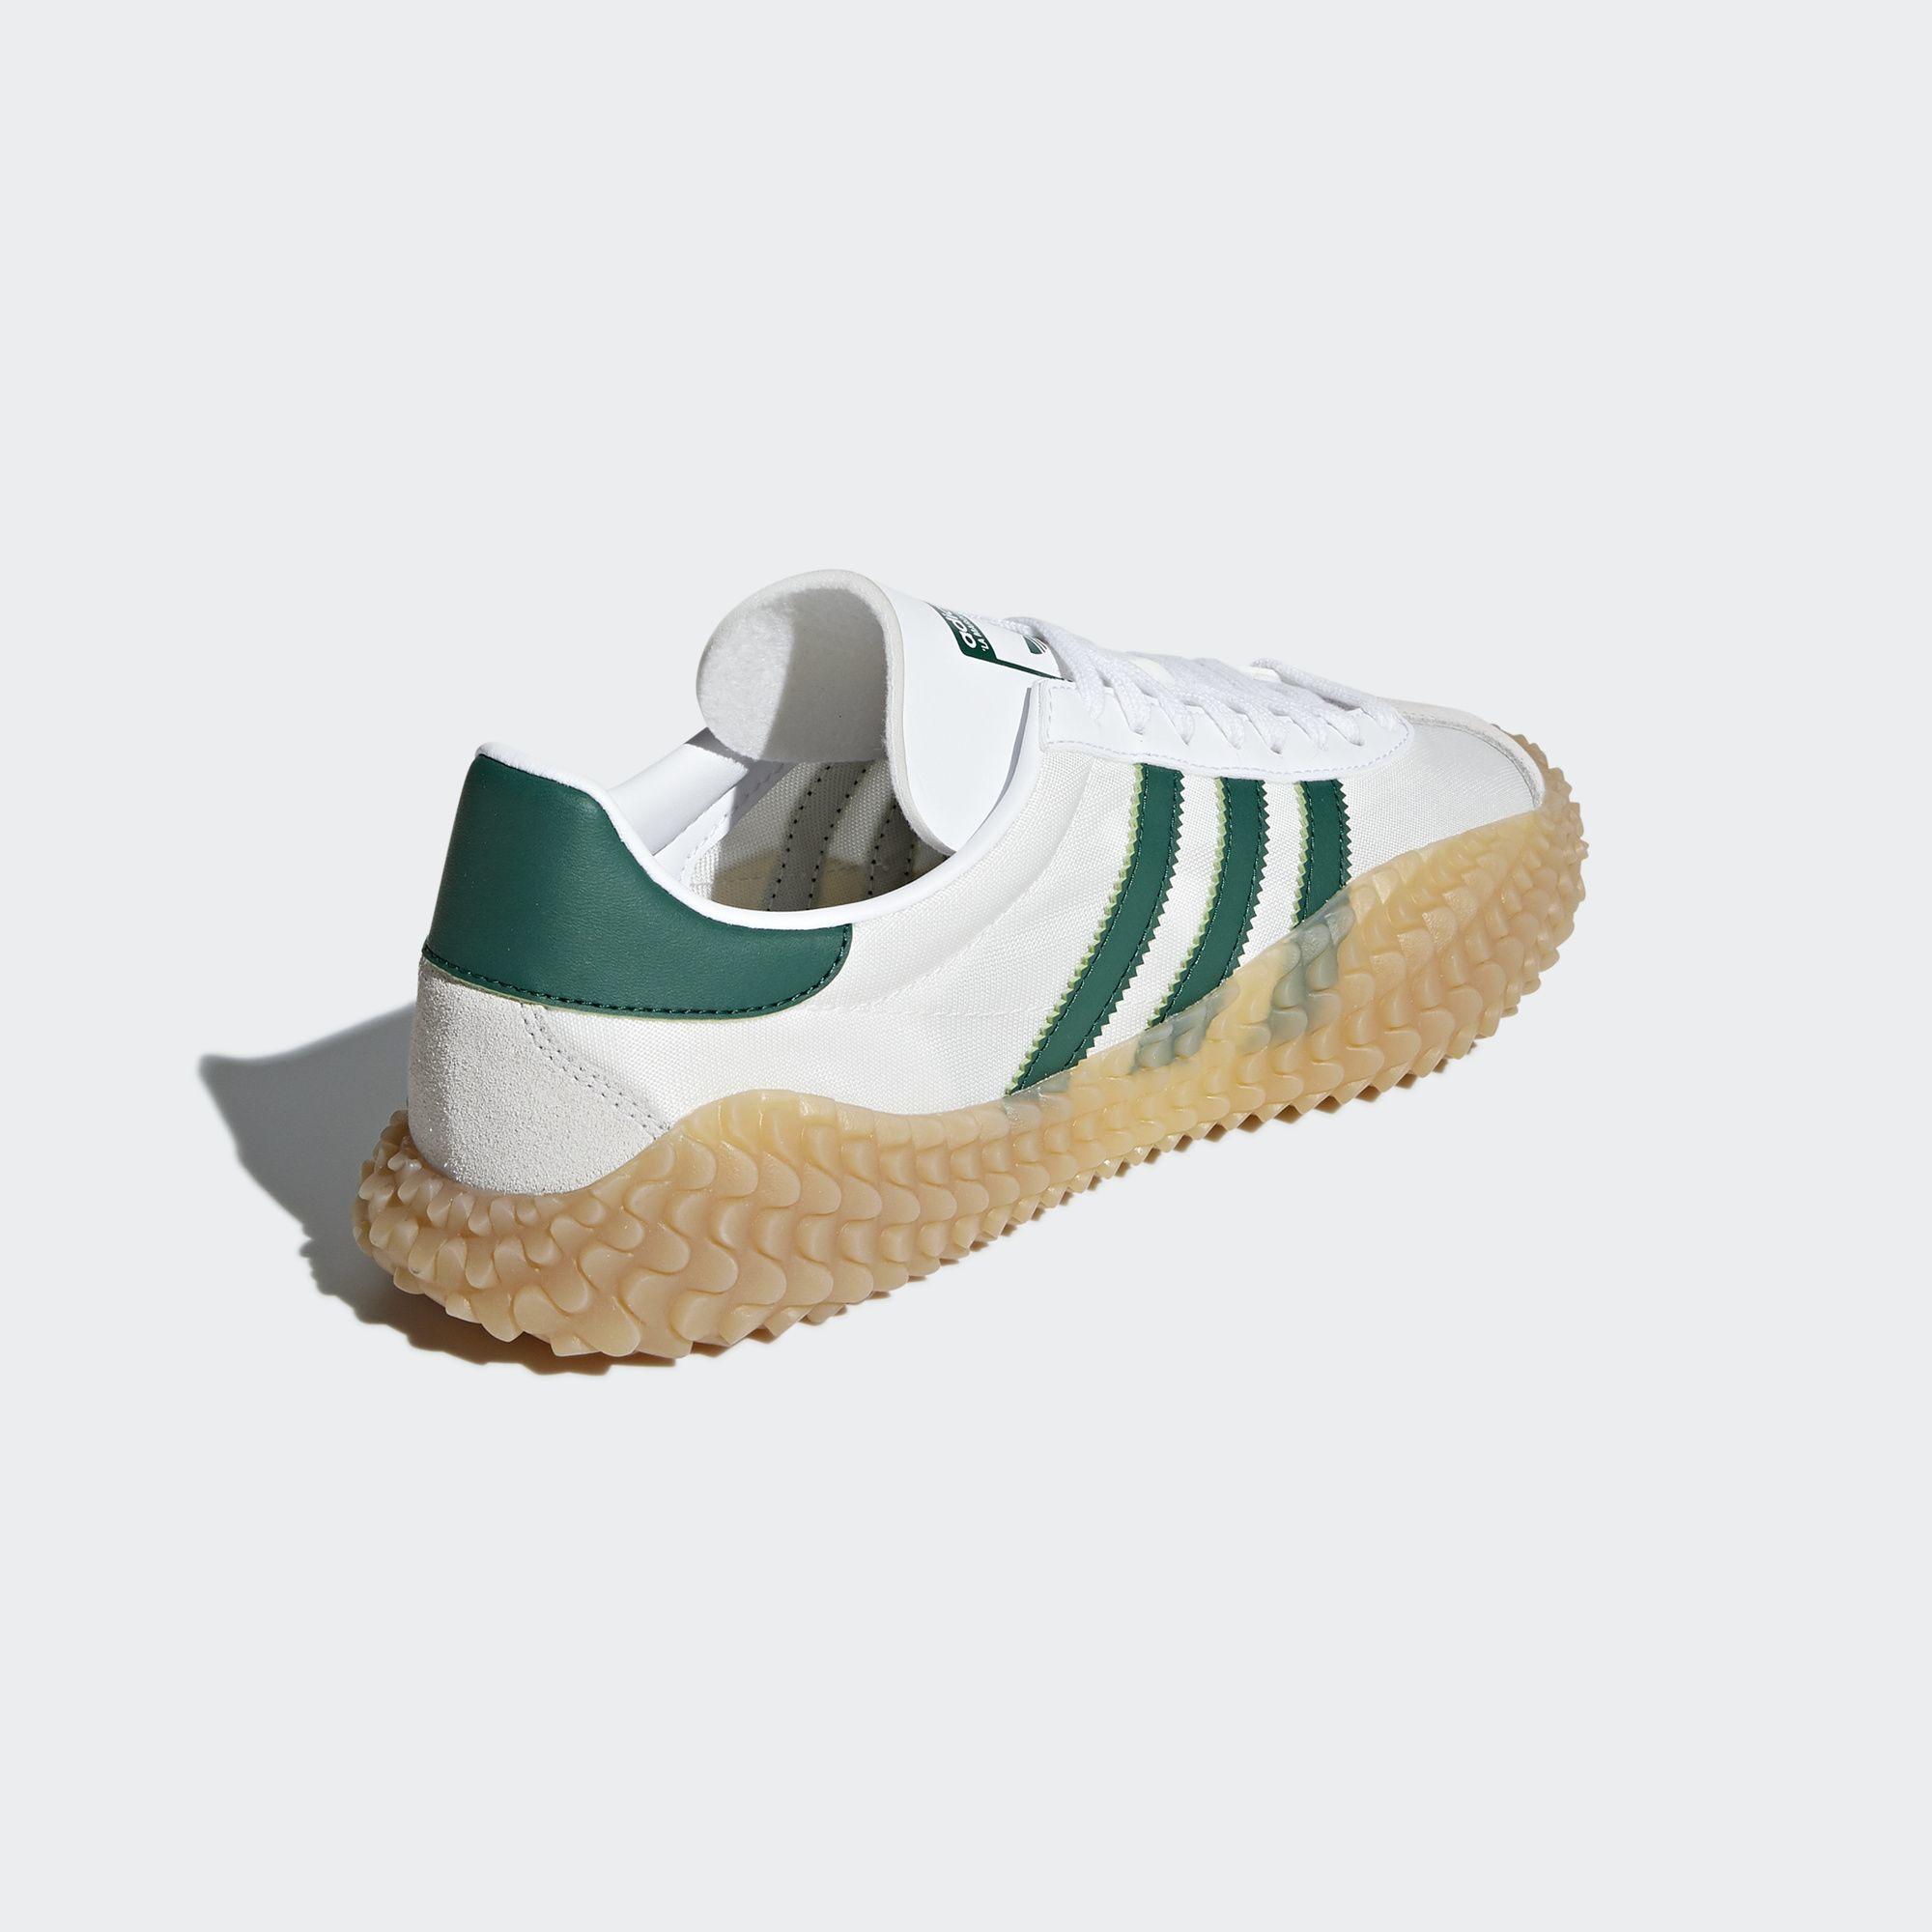 Adidas Kamanda Country 6